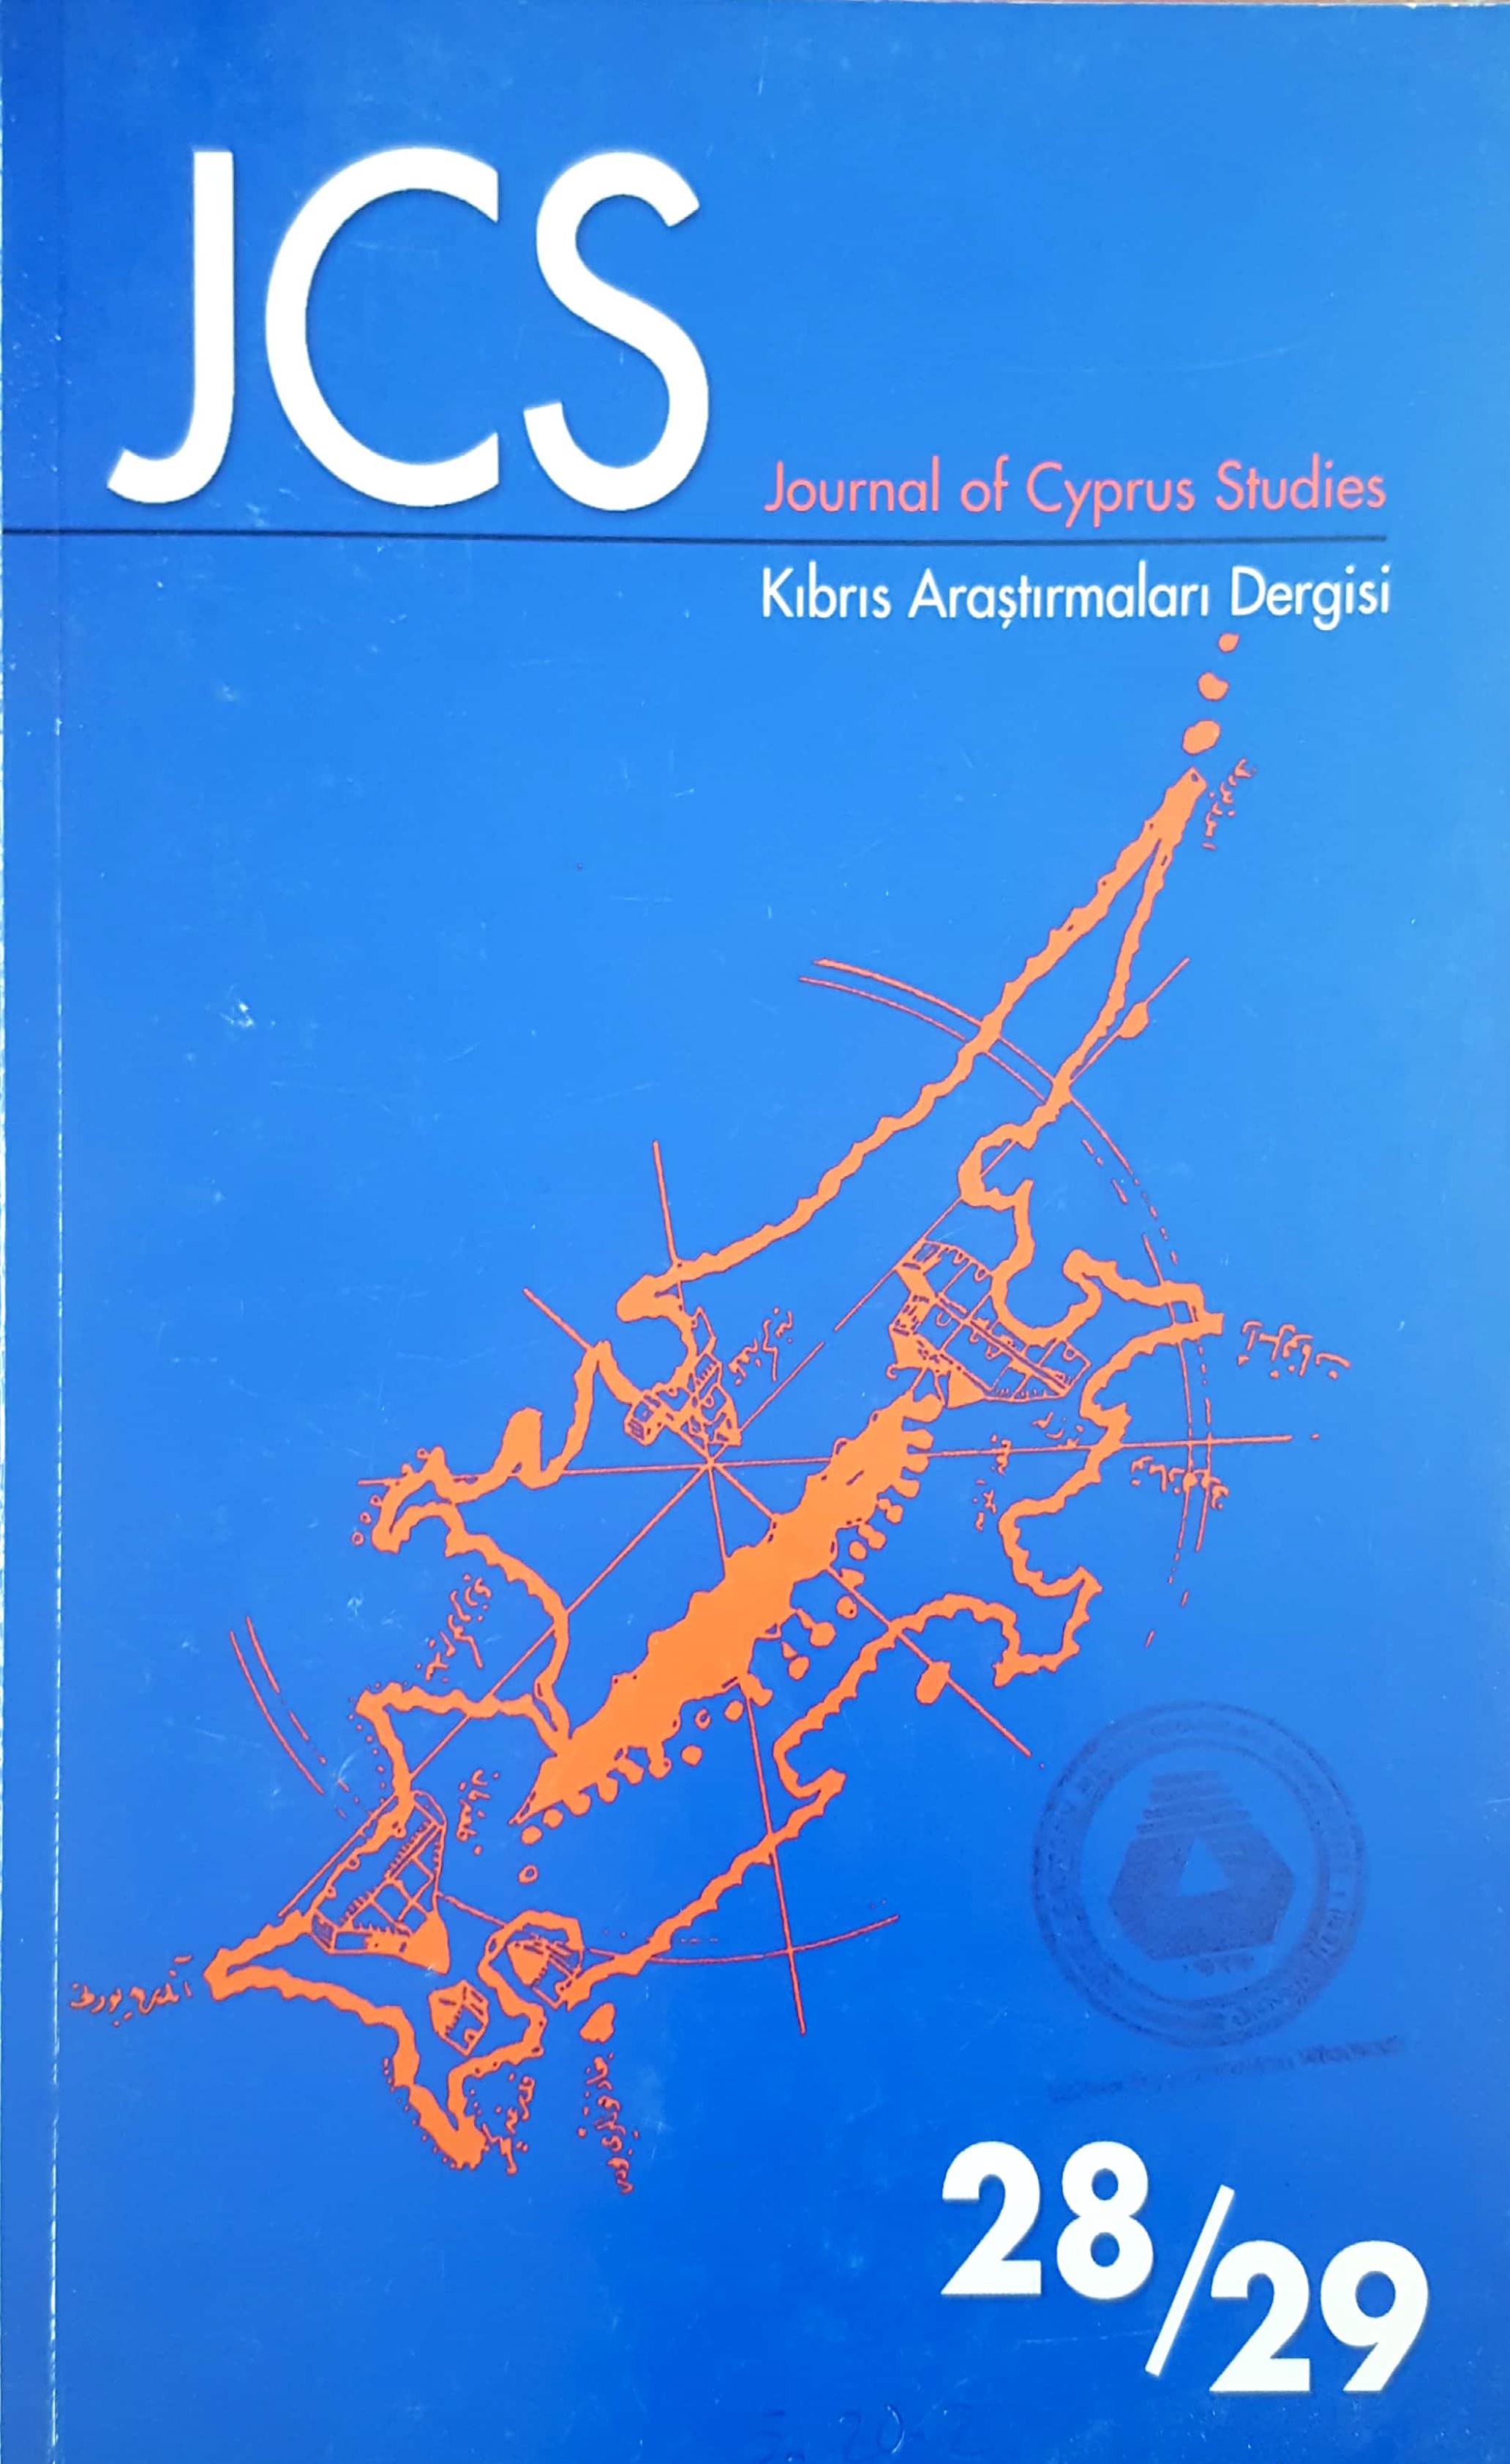 View Vol. 11 No. 28/29 (2005): Journal of Cyprus Studies